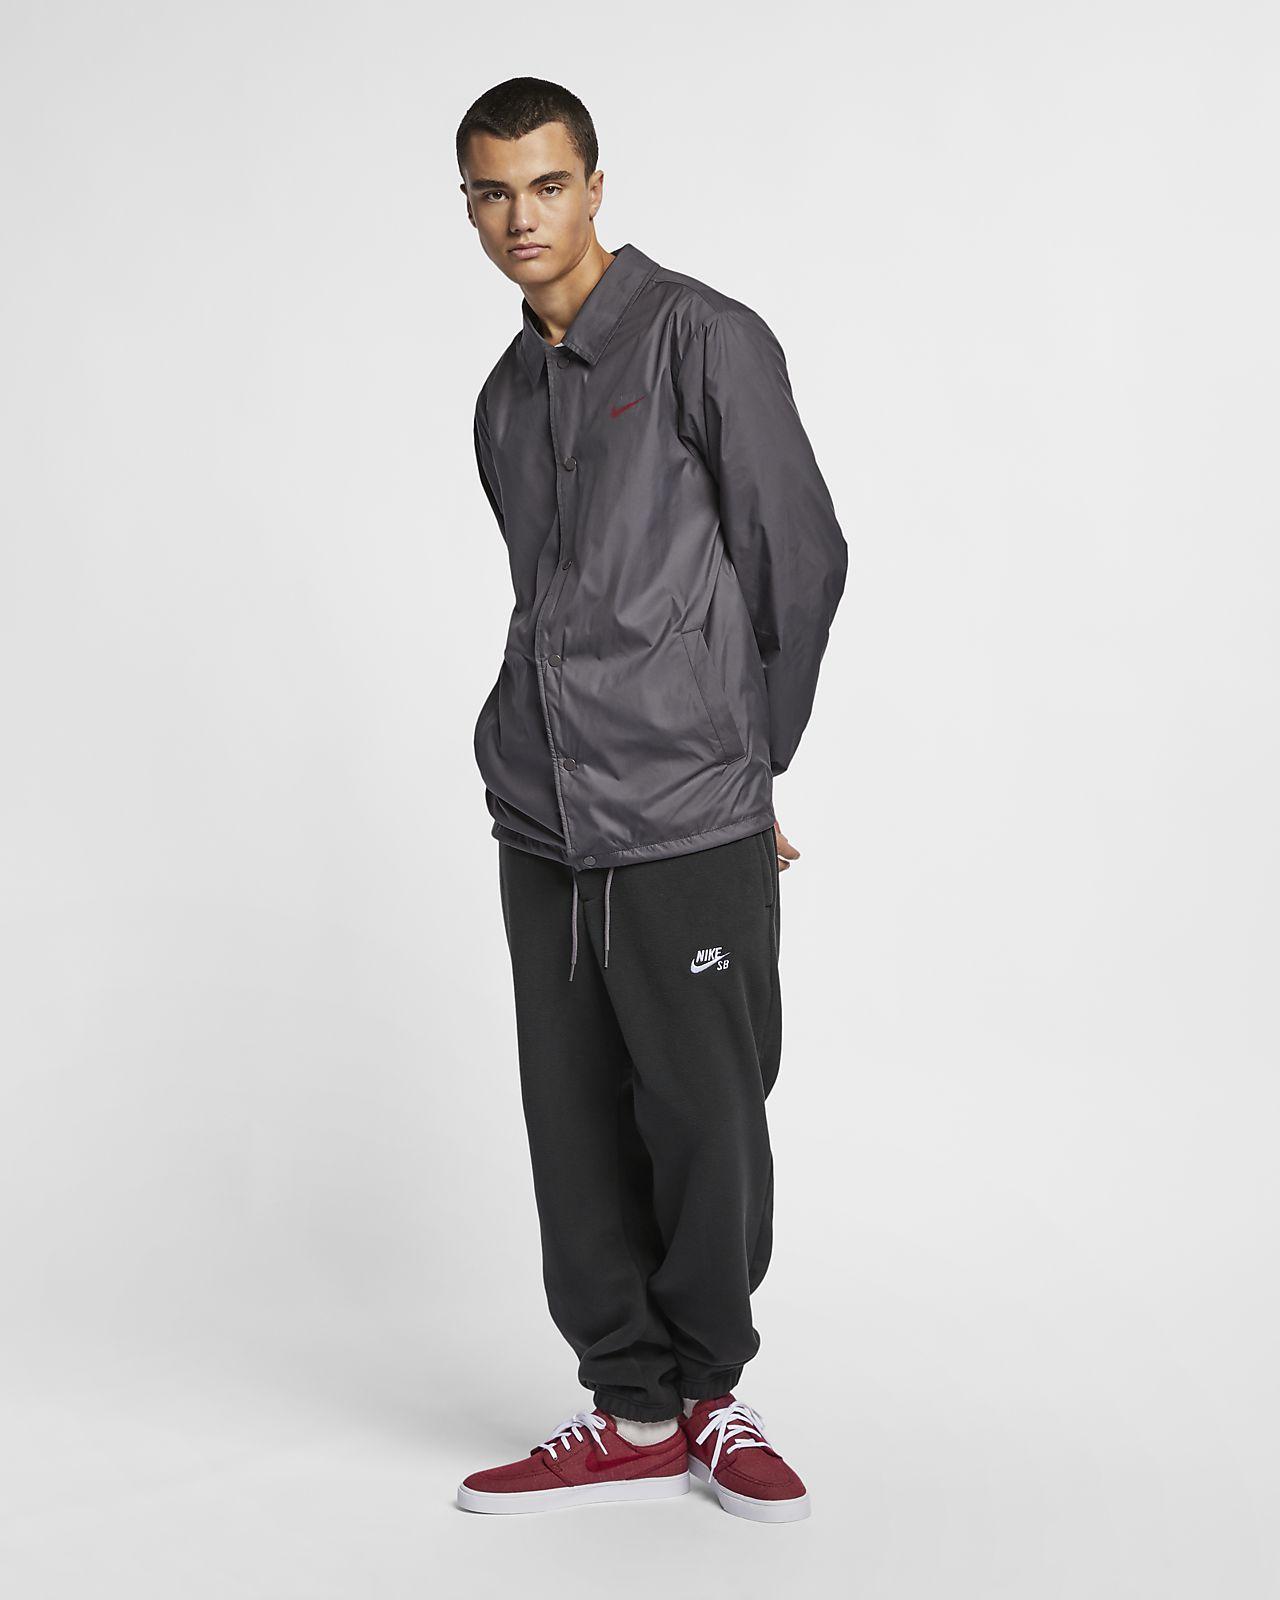 the latest f12c4 21a60 ... Nike SB Shield Men s Skate Jacket